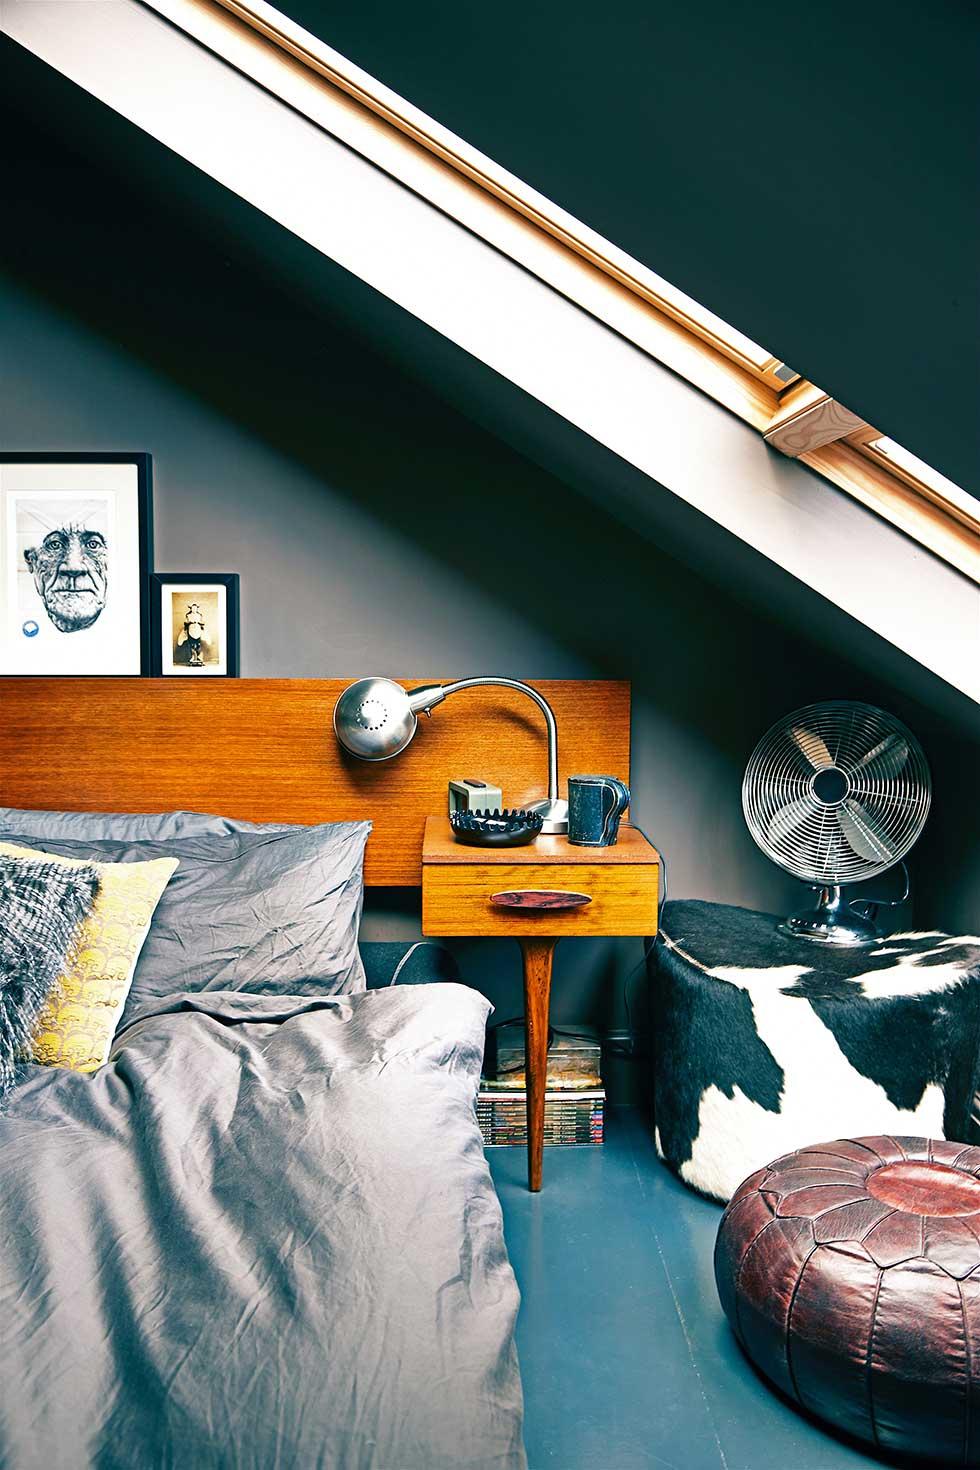 Duplex apartment mid-century bed in dark bedroom